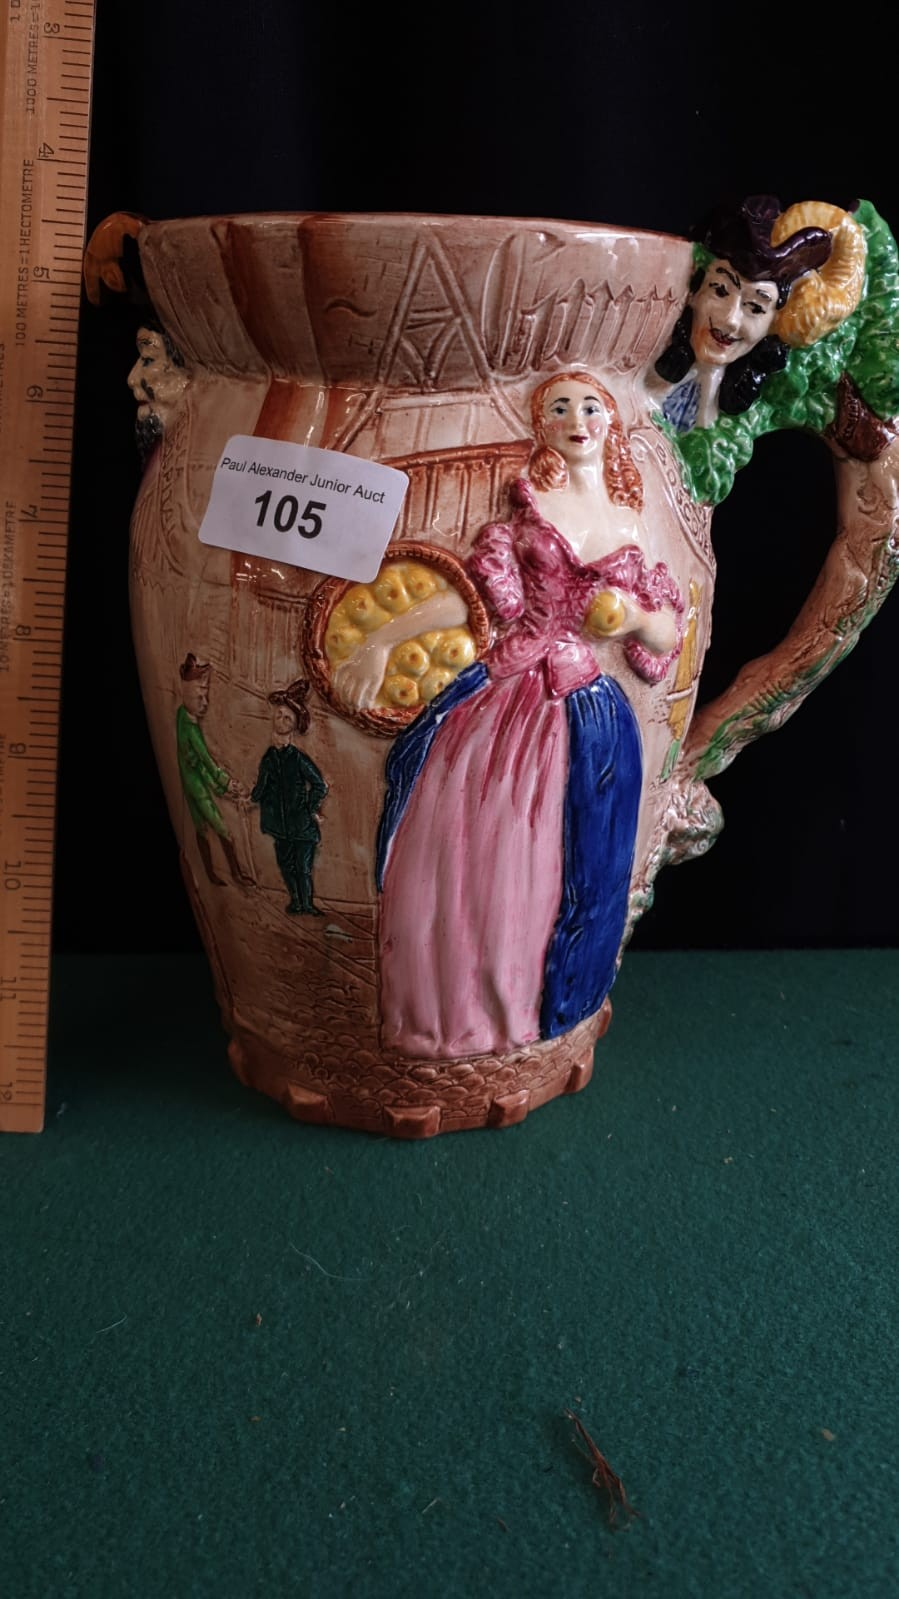 Burleigh Ware Large Nell Gwyn Water Jug. - Image 2 of 4